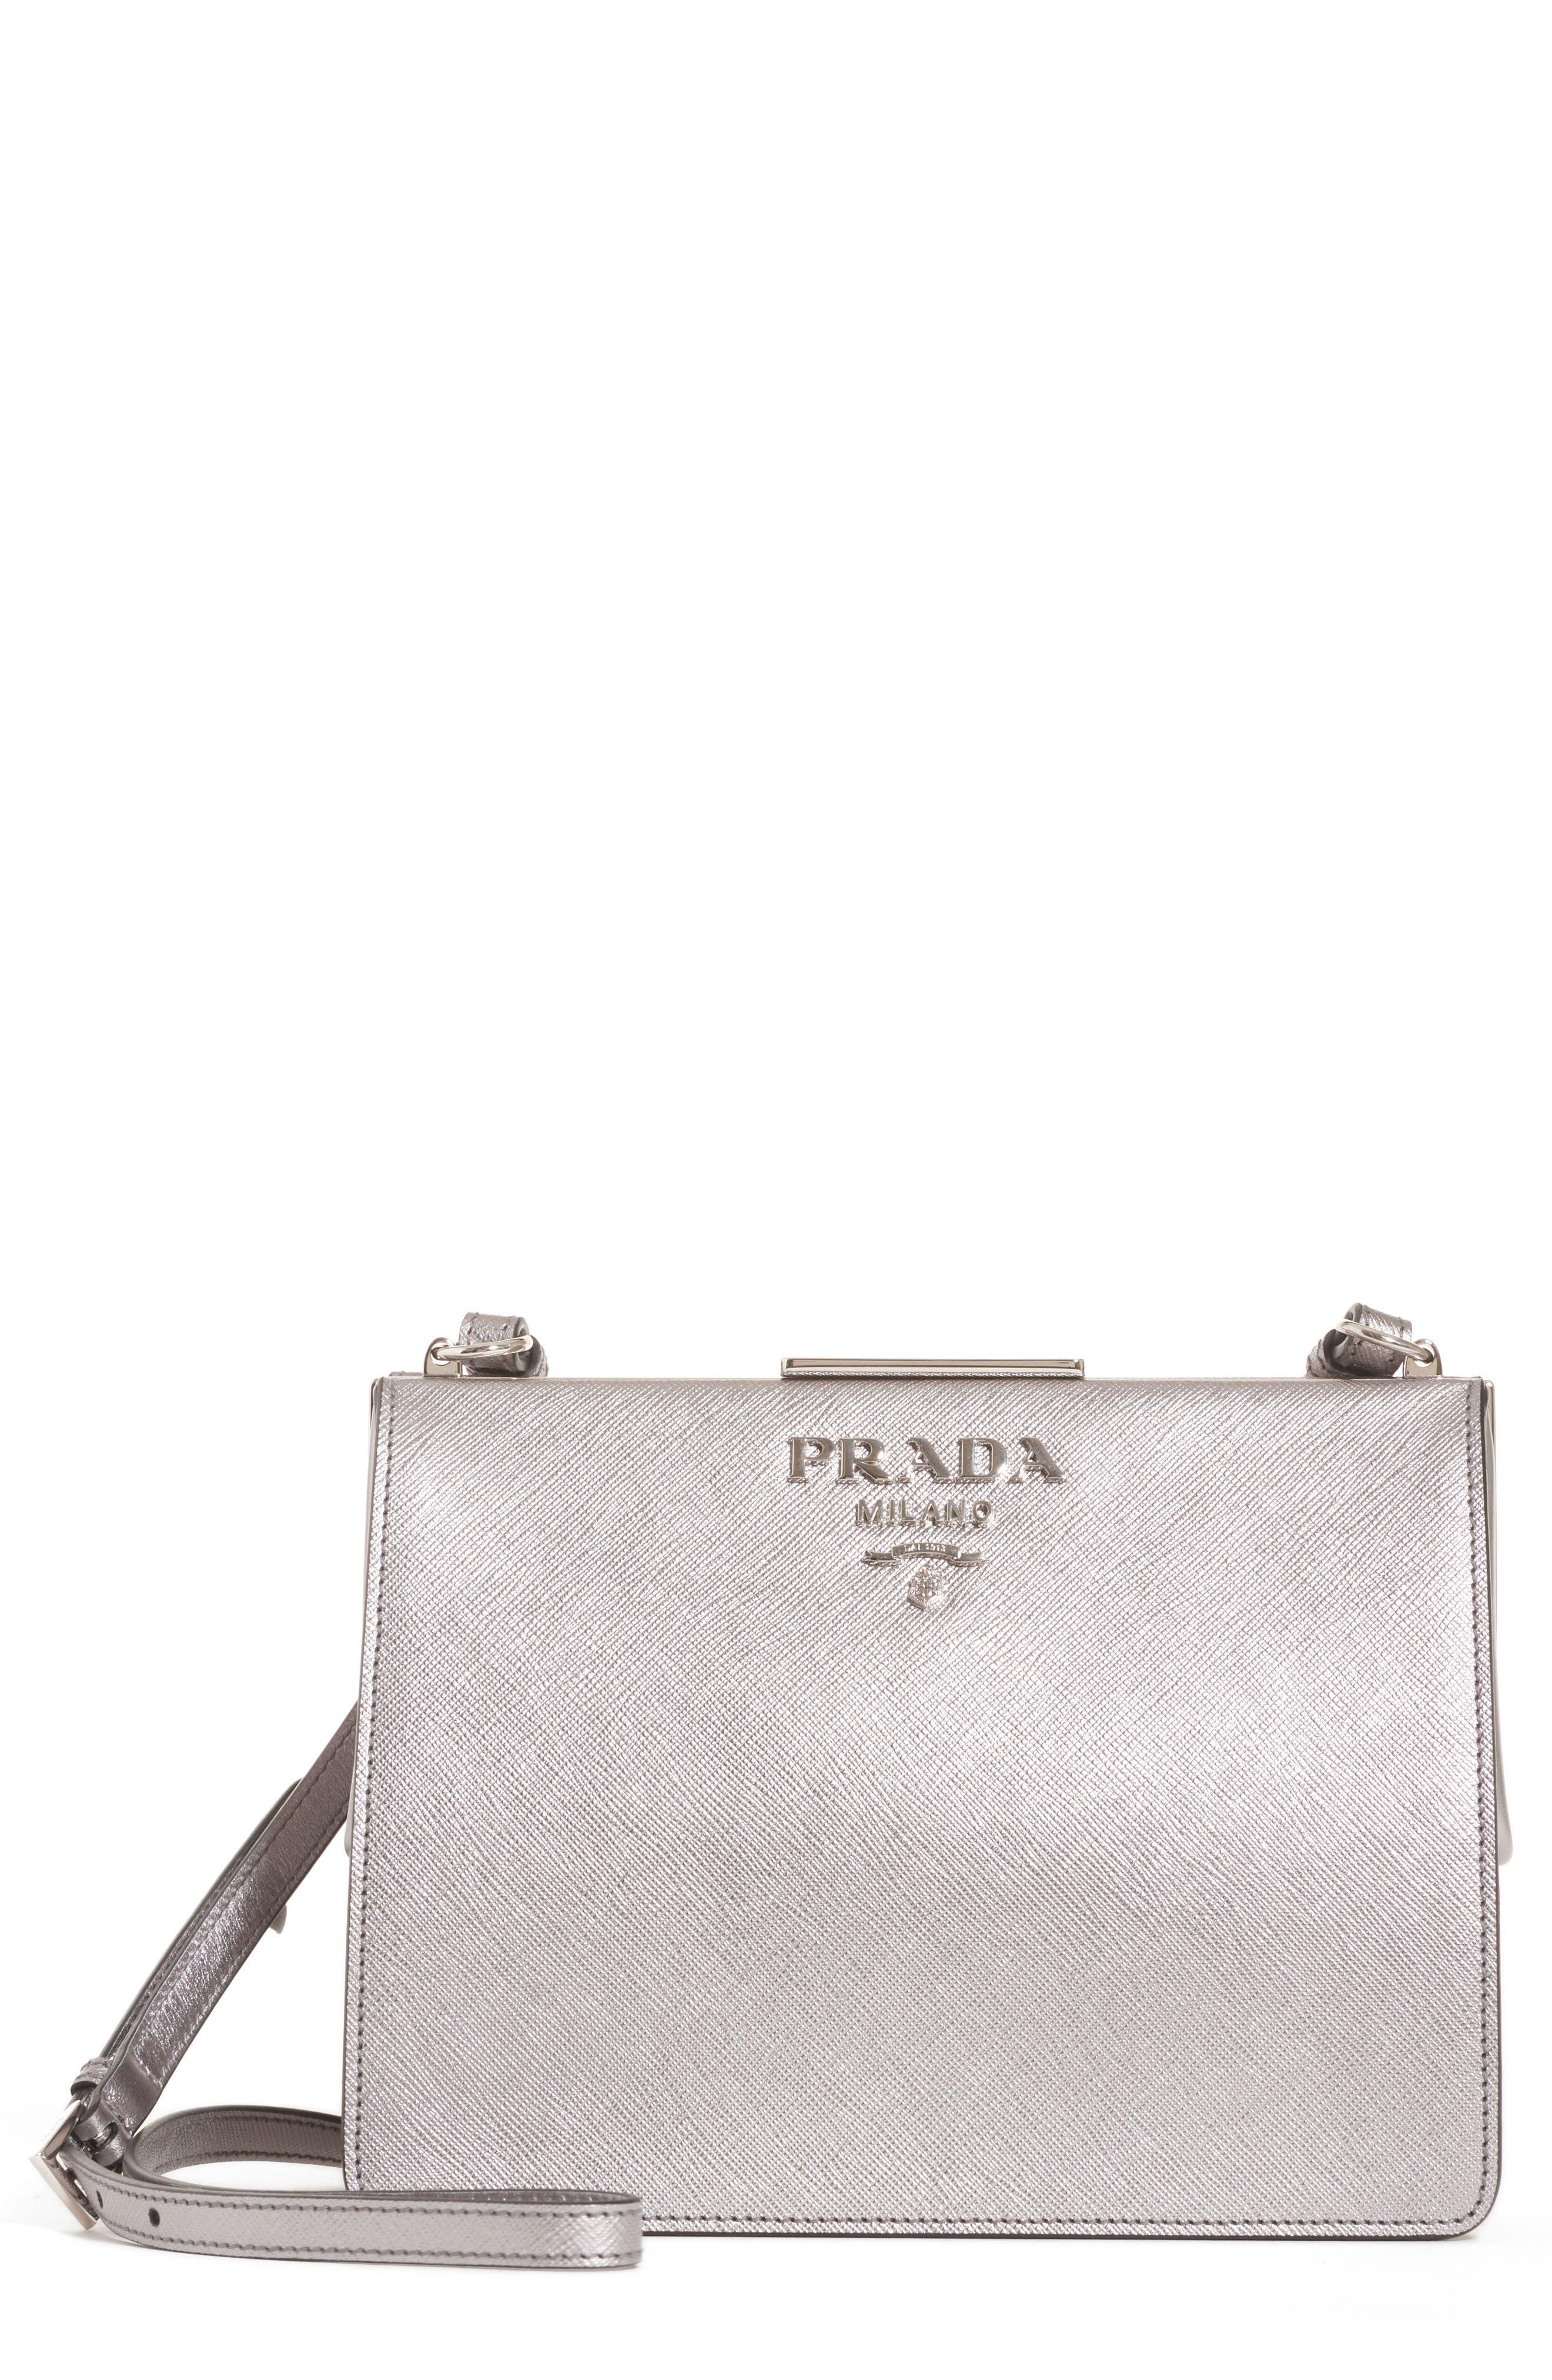 Small Frame Saffiano & City Calfskin Leather Shoulder Bag,                         Main,                         color, Cromo